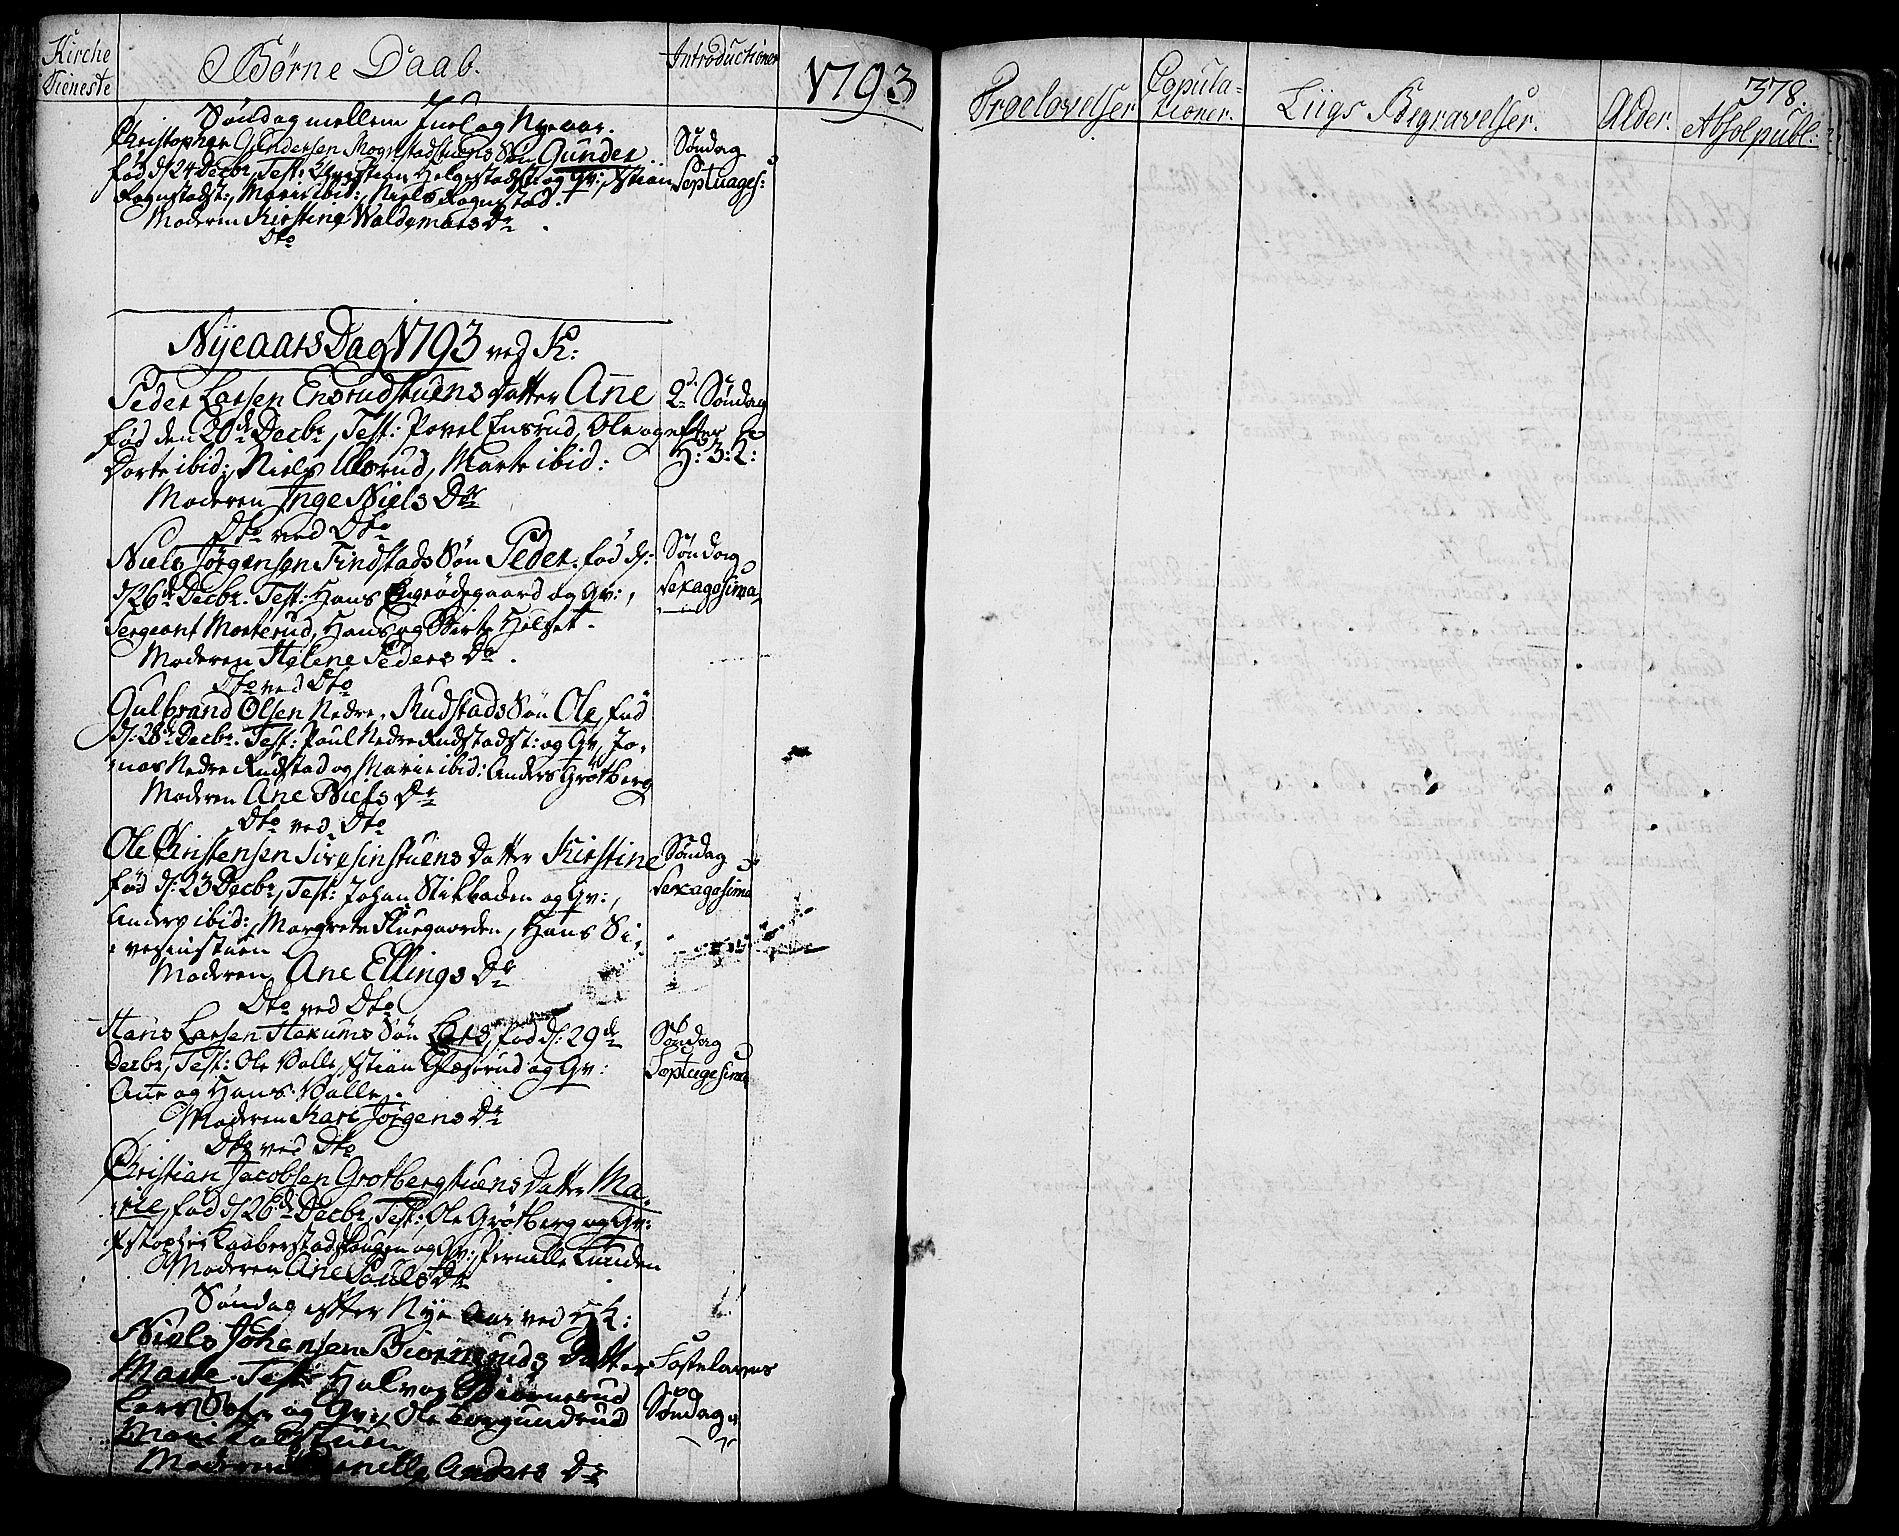 SAH, Toten prestekontor, Ministerialbok nr. 6, 1773-1793, s. 378